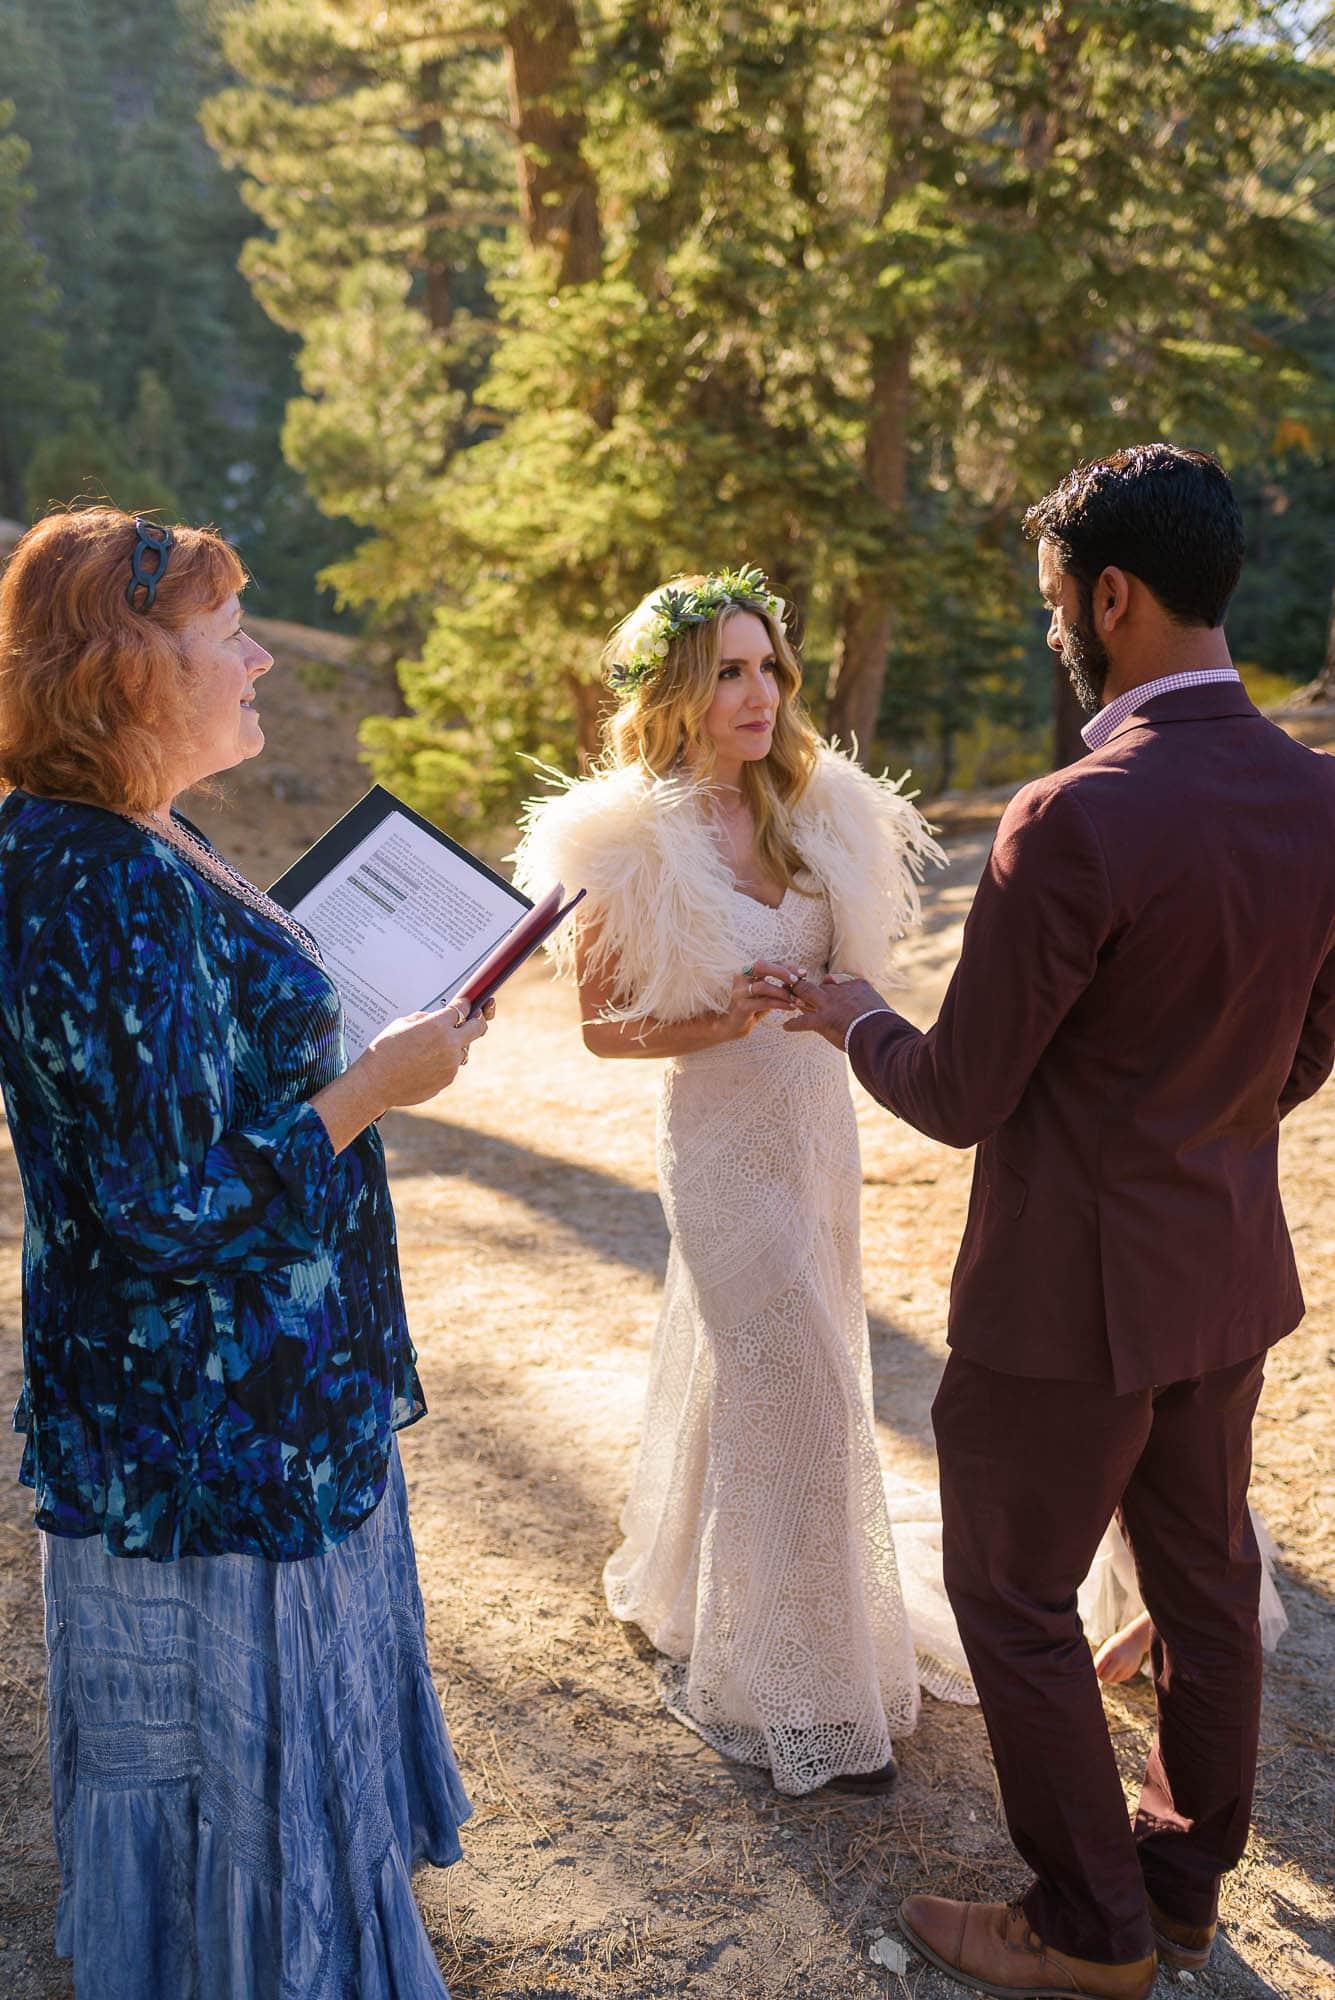 025_Alan_and_Heidi_Wedding_Natalie_Mike